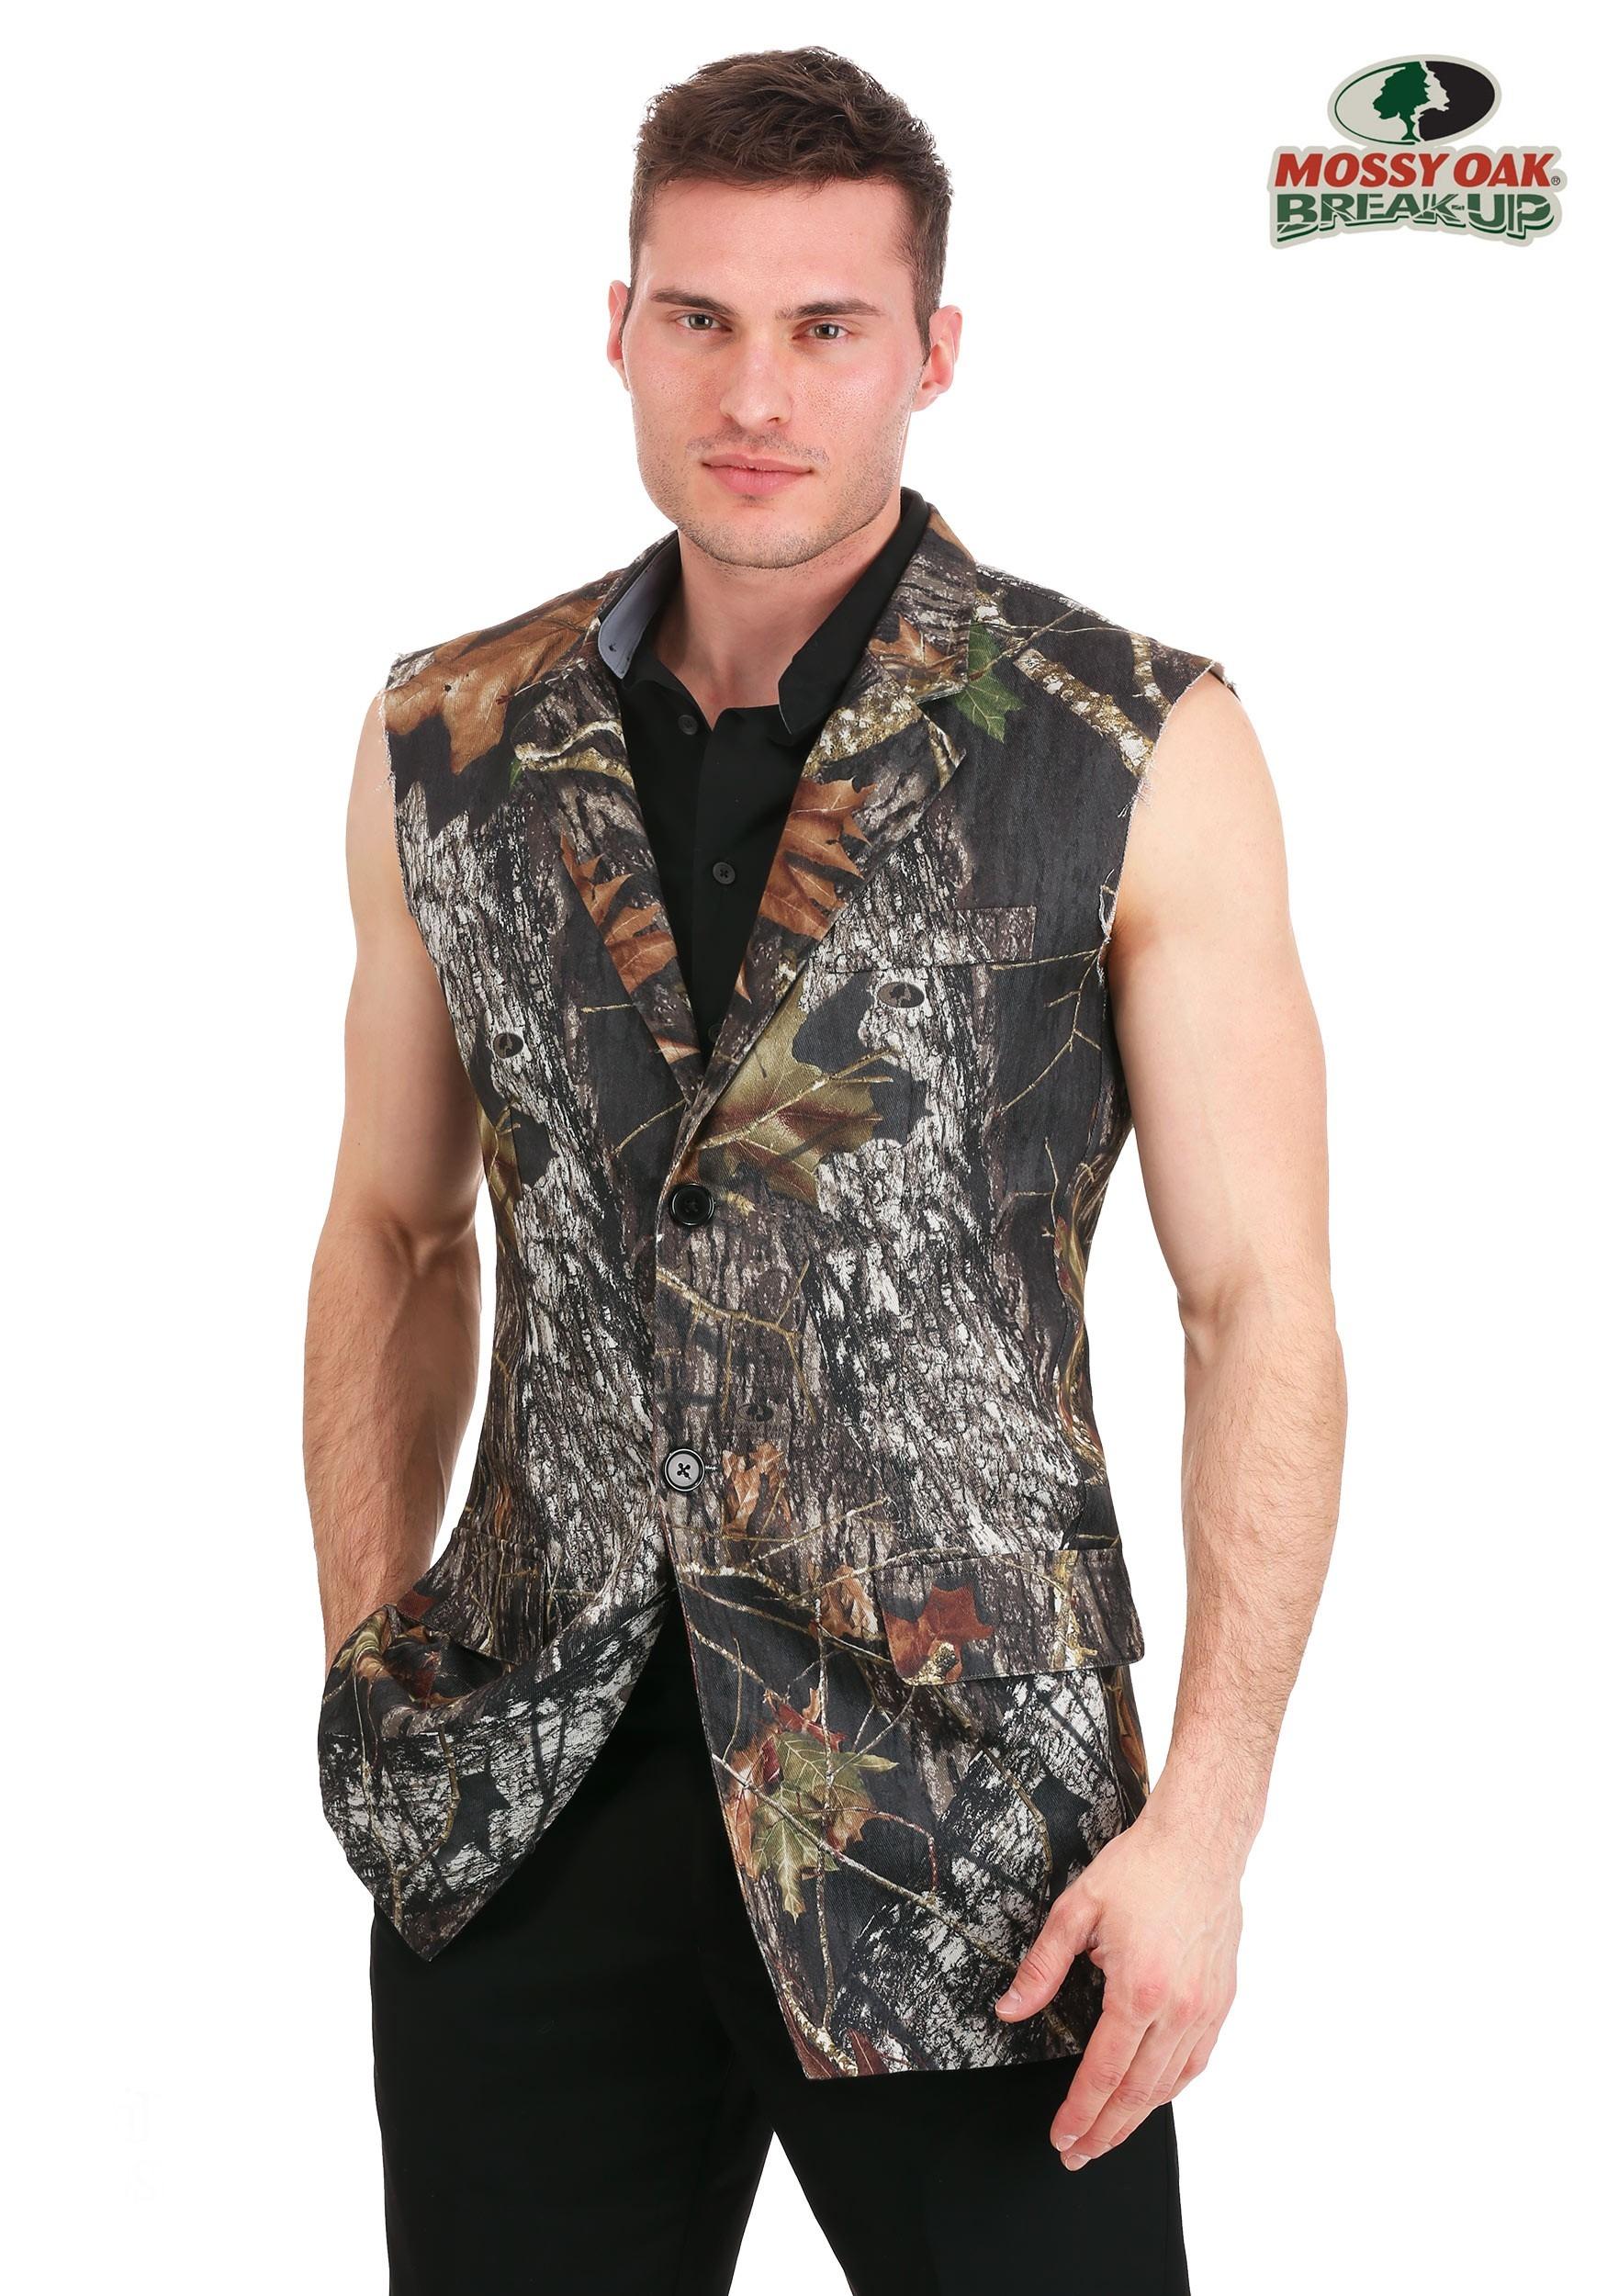 Plus Size Men\'s Mossy Oak Sleeveless Tuxedo Jacket